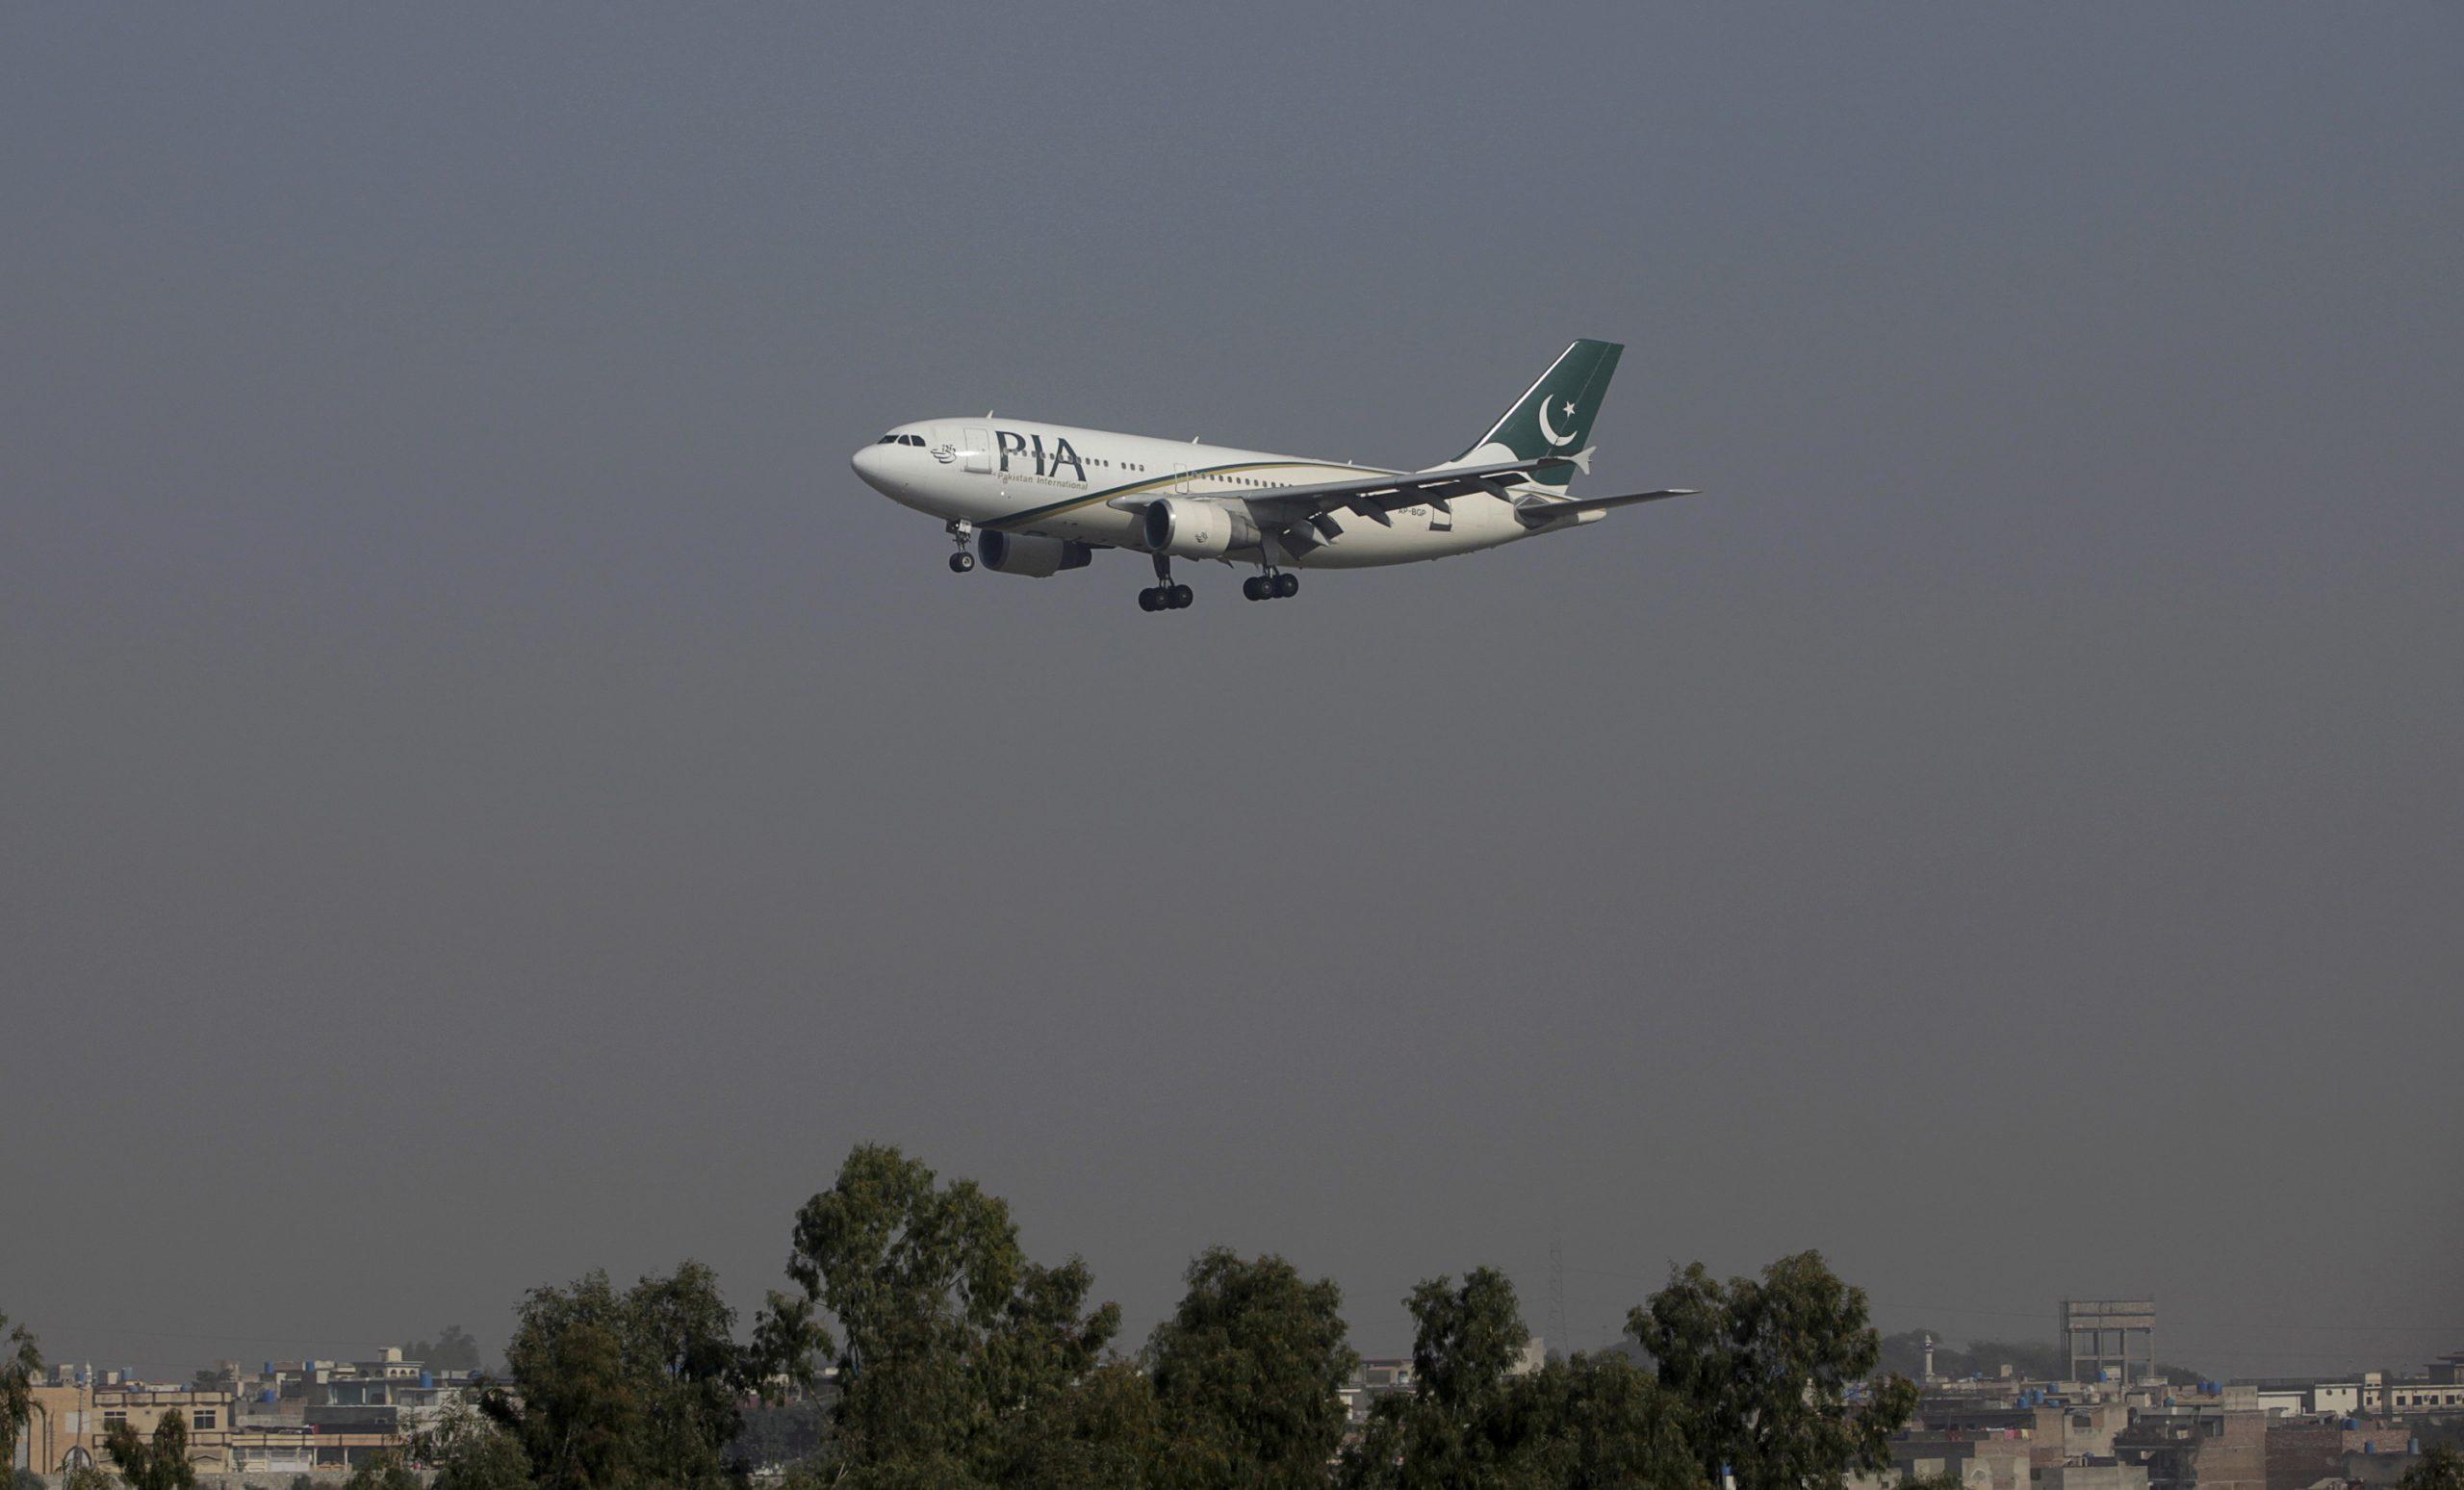 FILE PHOTO: A Pakistan International Airlines (PIA) passenger plane arrives at the Benazir International airport in Islamabad, Pakistan, December 2, 2015. REUTERS/Faisal Mahmood/File Photo